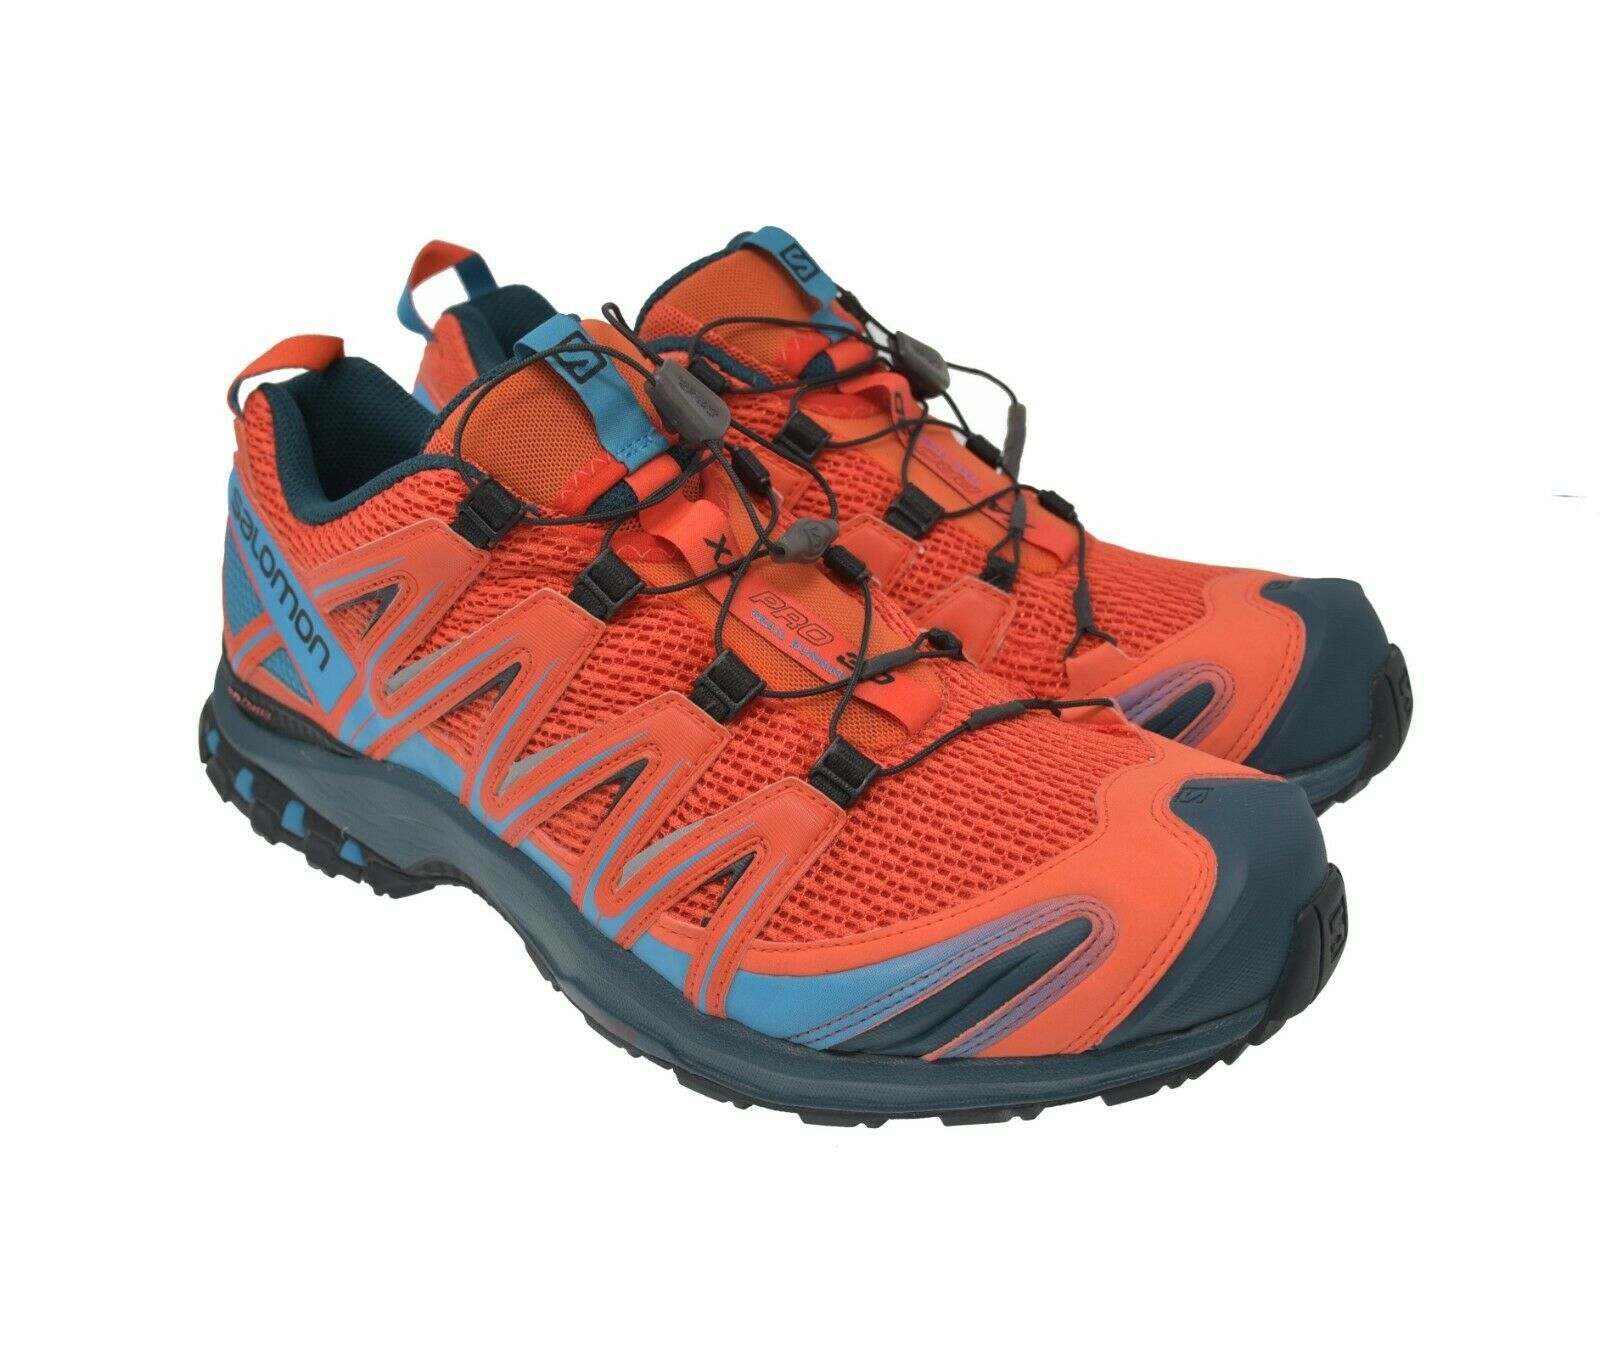 Solomon XA PRO 3D Trail Running Men's Sz 12.5 EU 47.5 Hiking Trail Sports Shoes